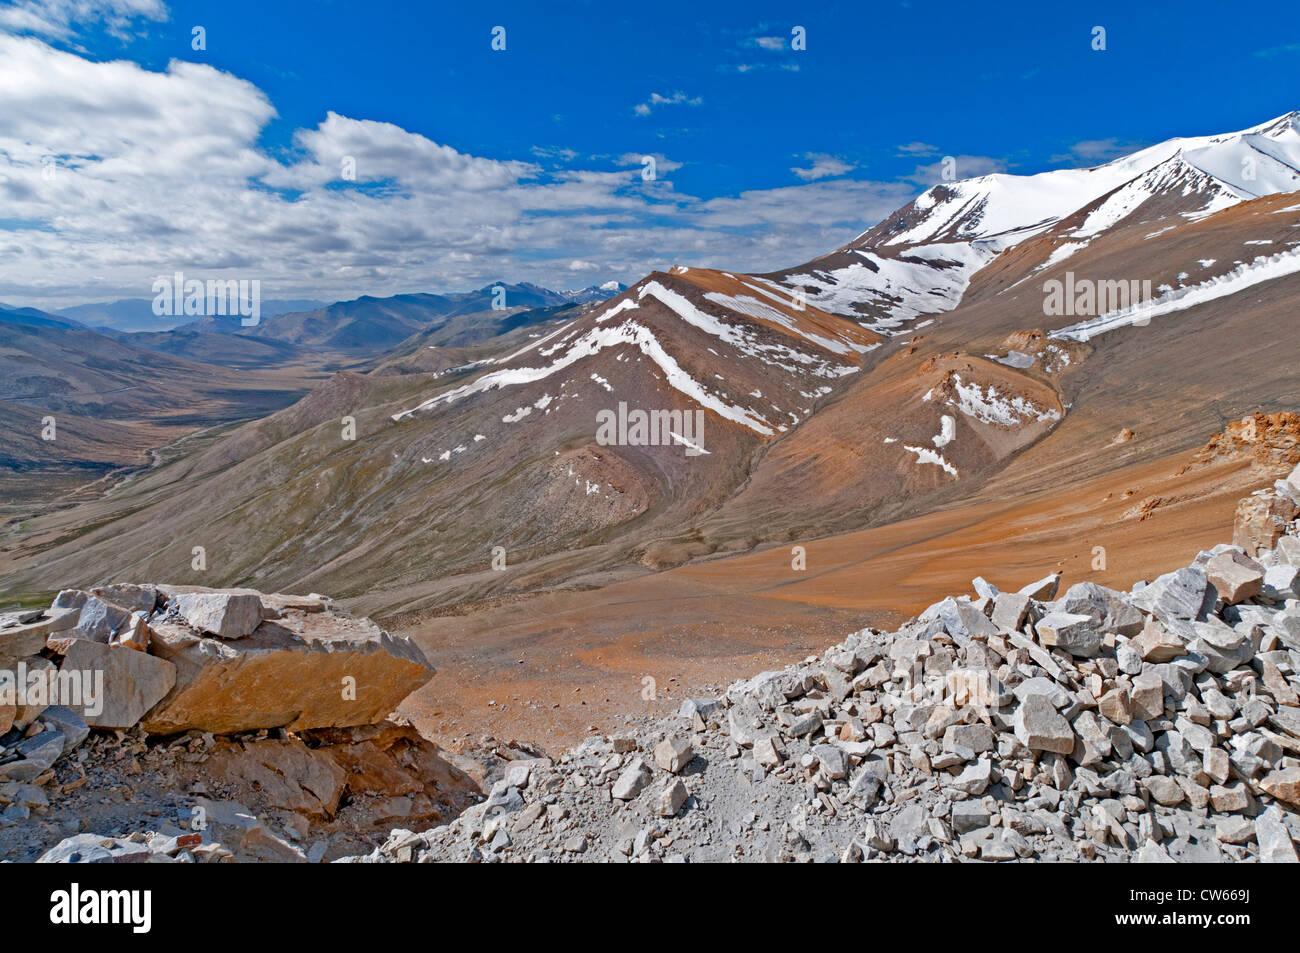 A scenic overlook on the Manali-Leh Highway near Taglangla Pass in the Zanskar Range in Ladakh, India - Stock Image